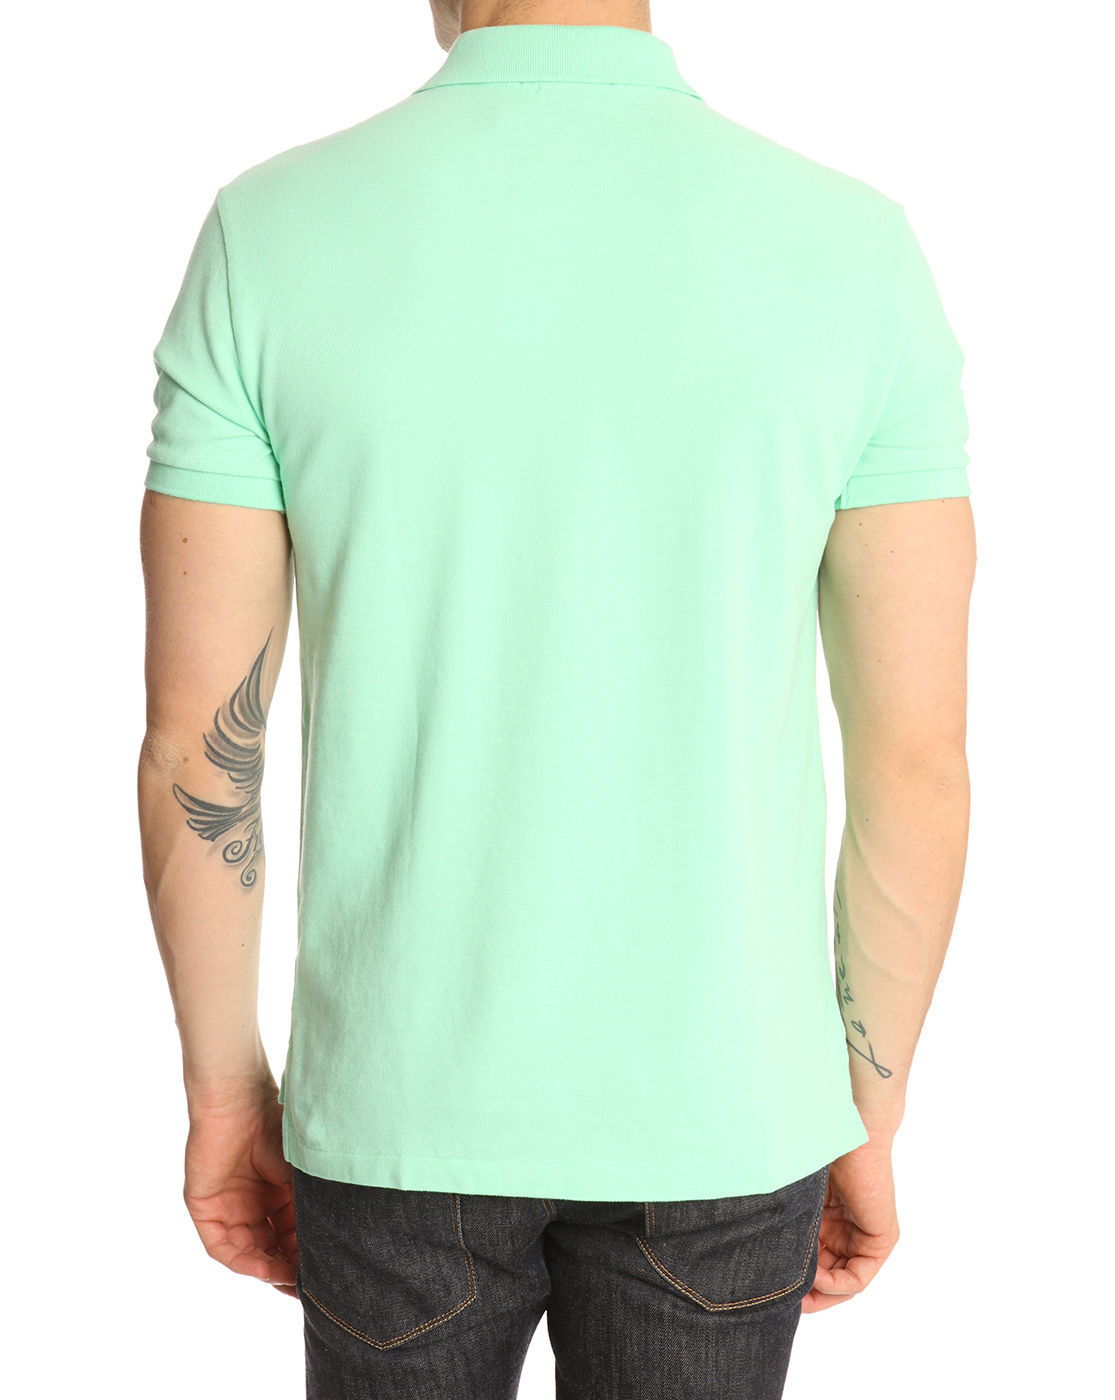 Polo ralph lauren Mint Green Slimfit Polo Shirt in Green ...